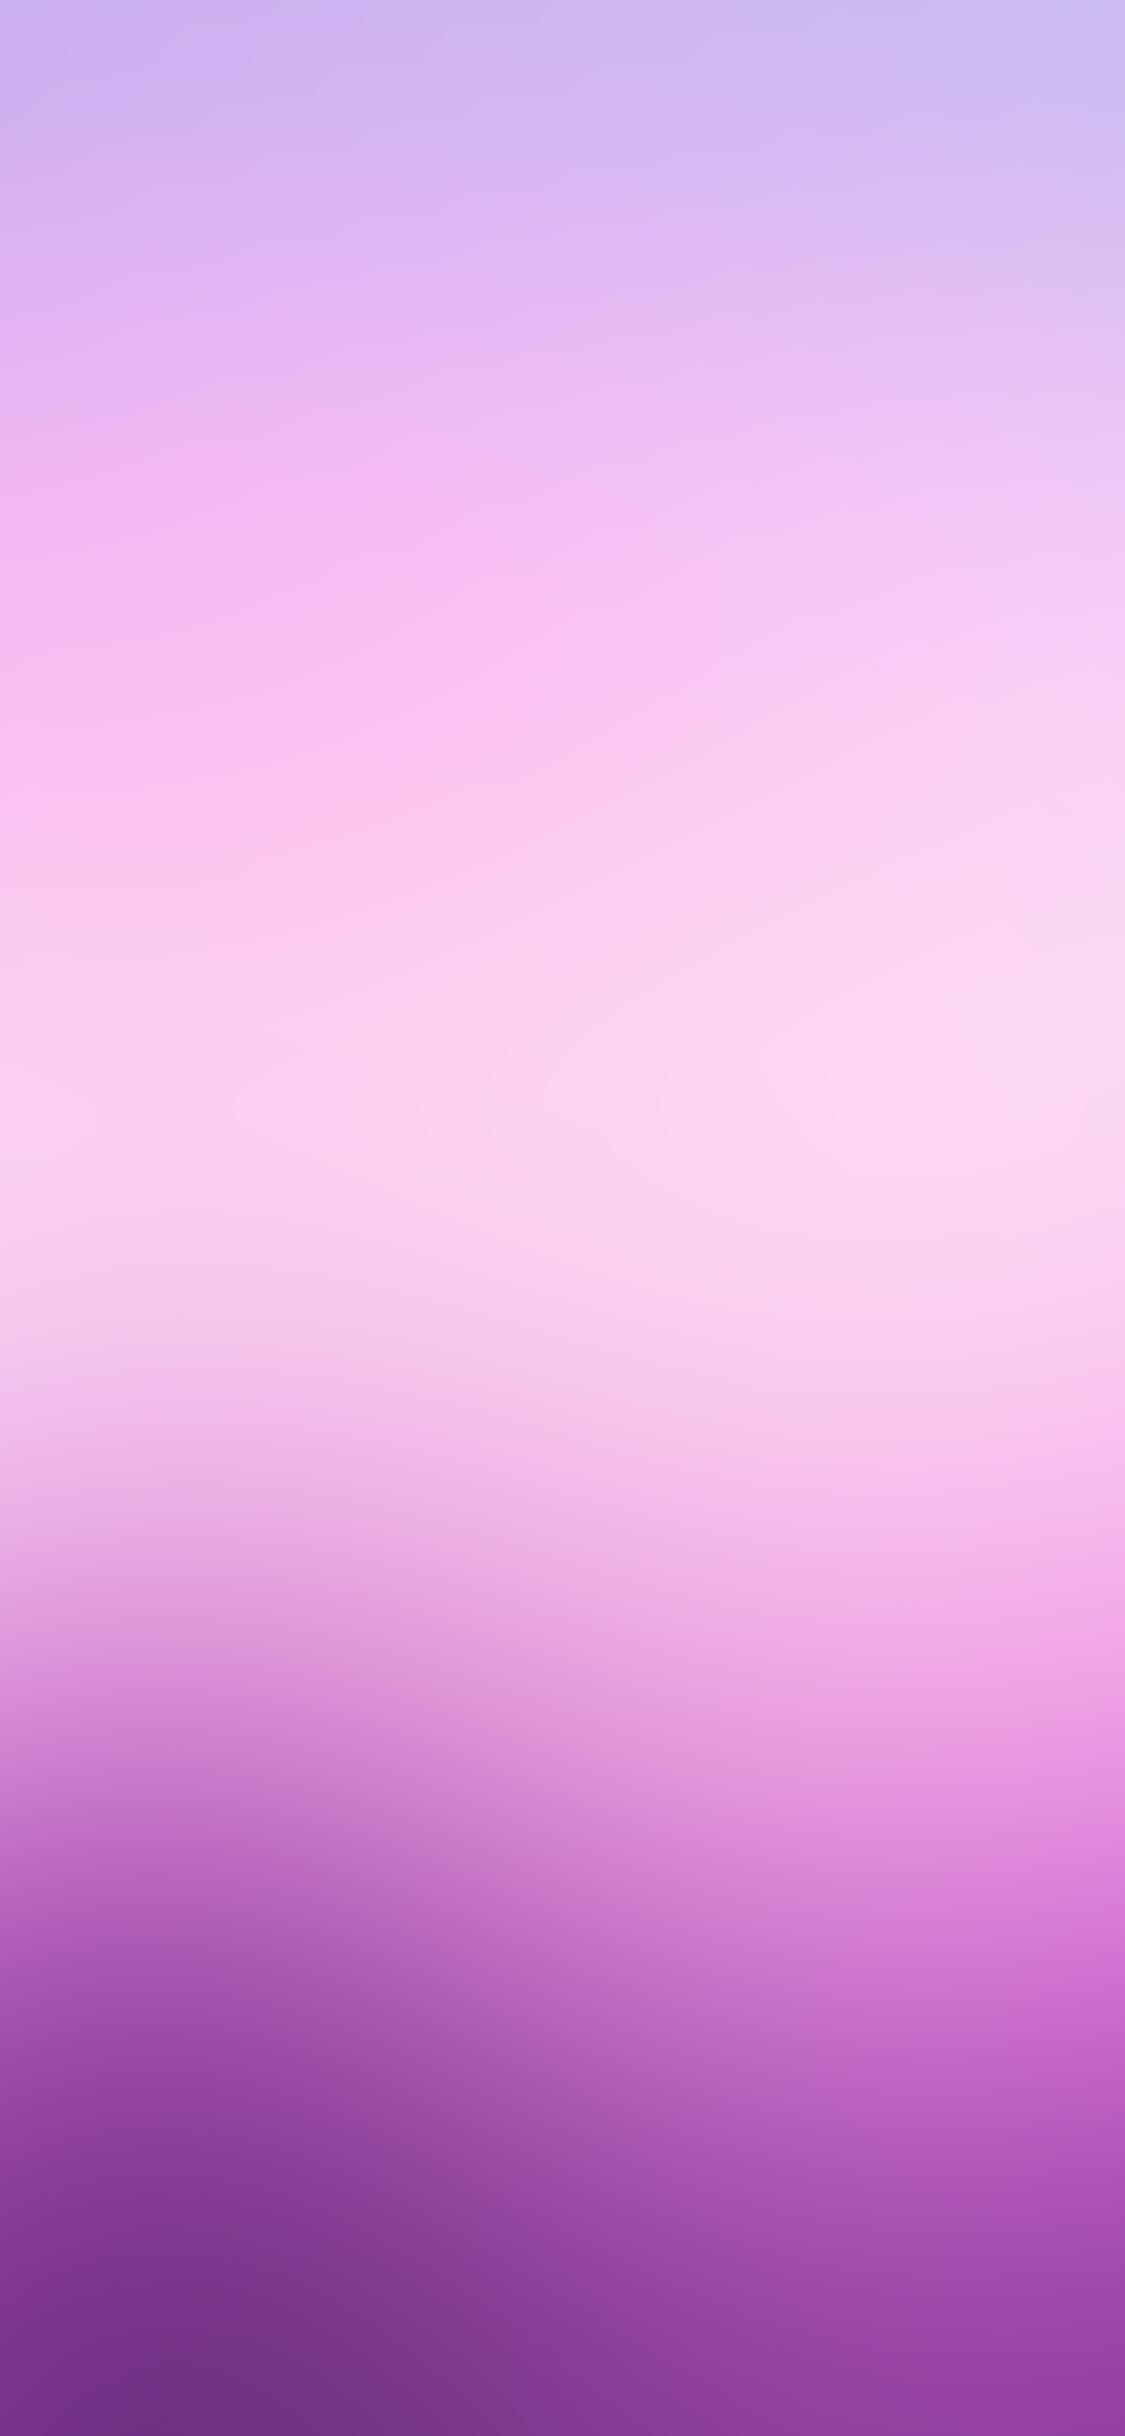 iPhonexpapers.com-Apple-iPhone-wallpaper-so21-blur-gradation-purple-sensation